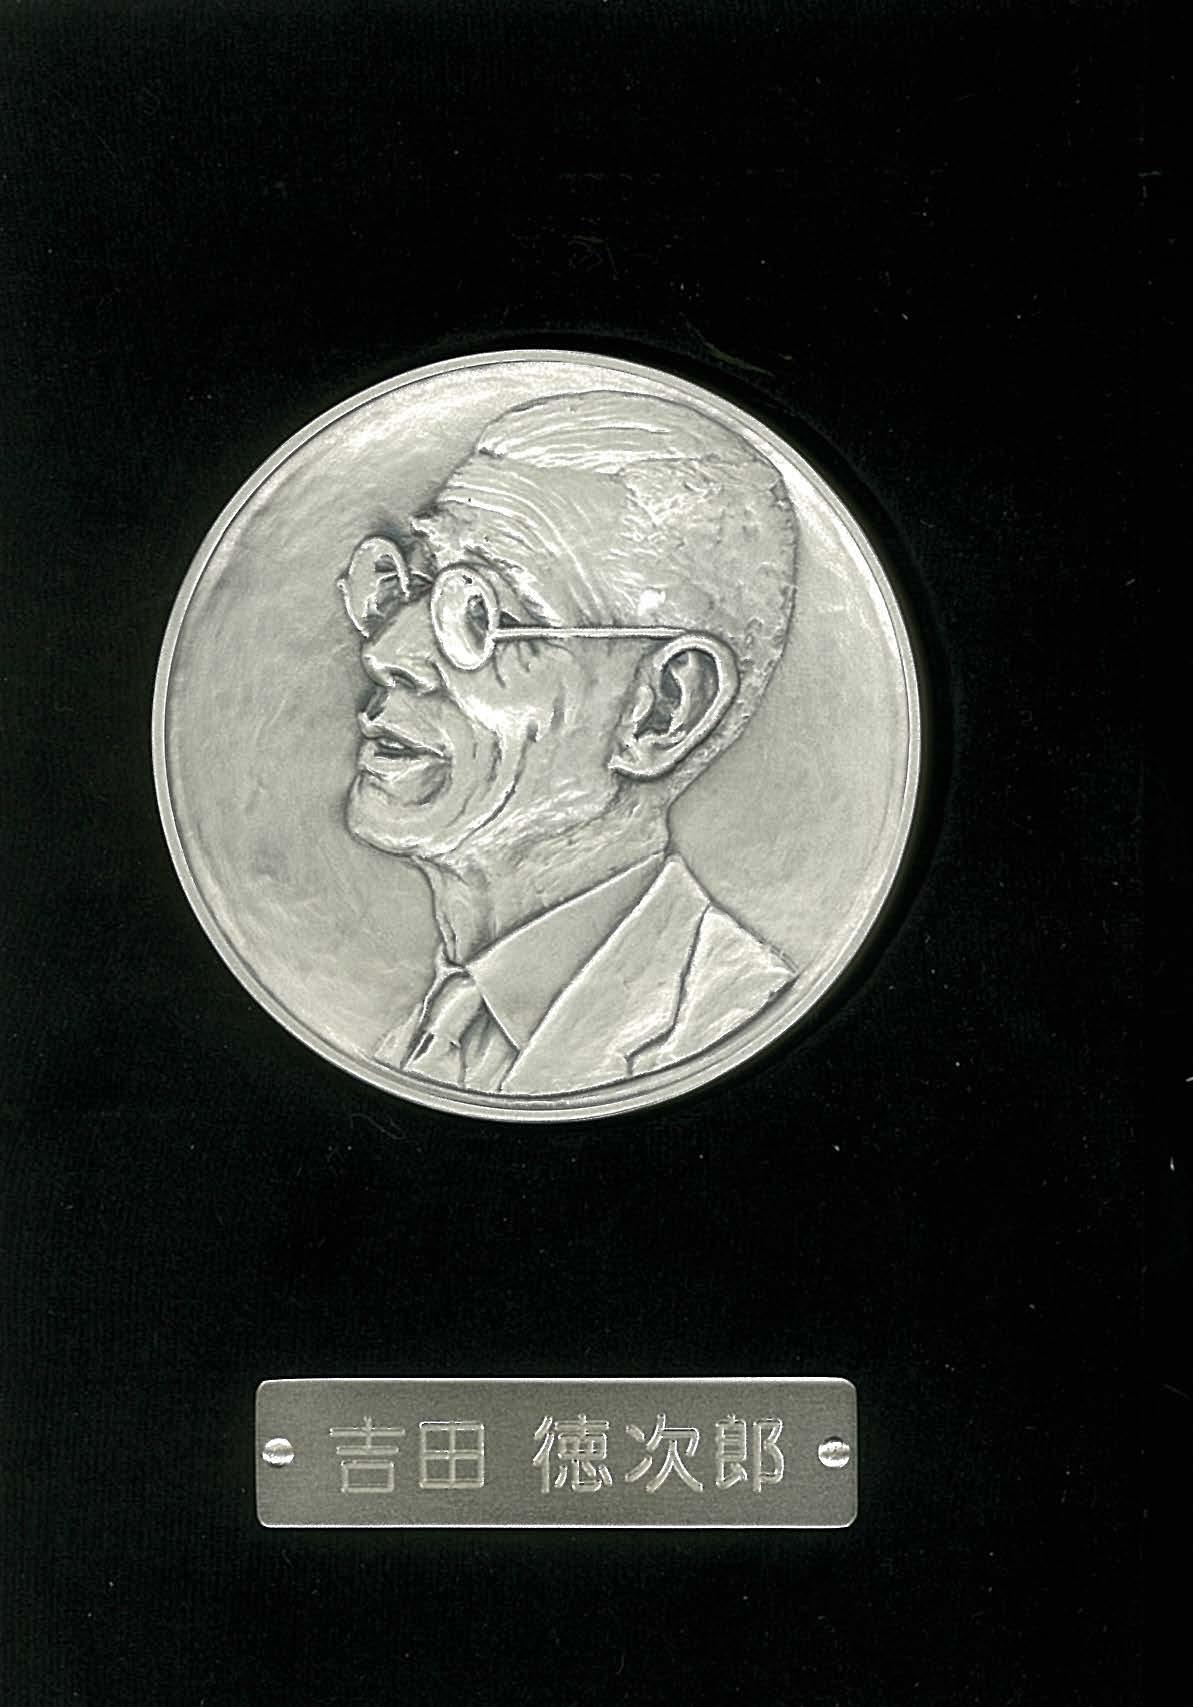 土木学会_メダル画像・表